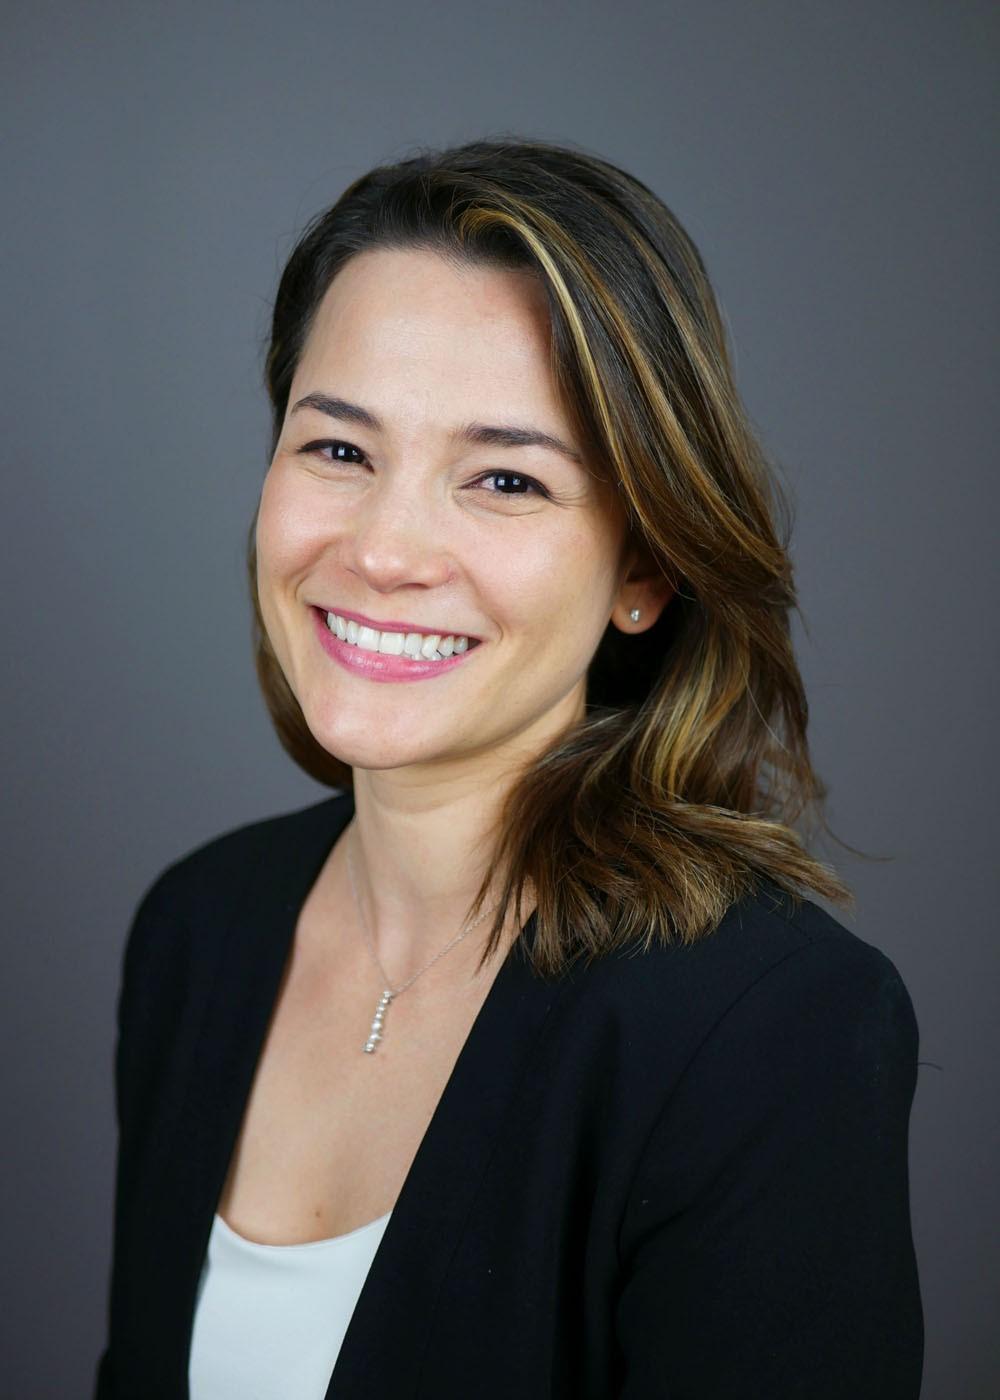 portrait of Dr. Katerine Cardona Salazar